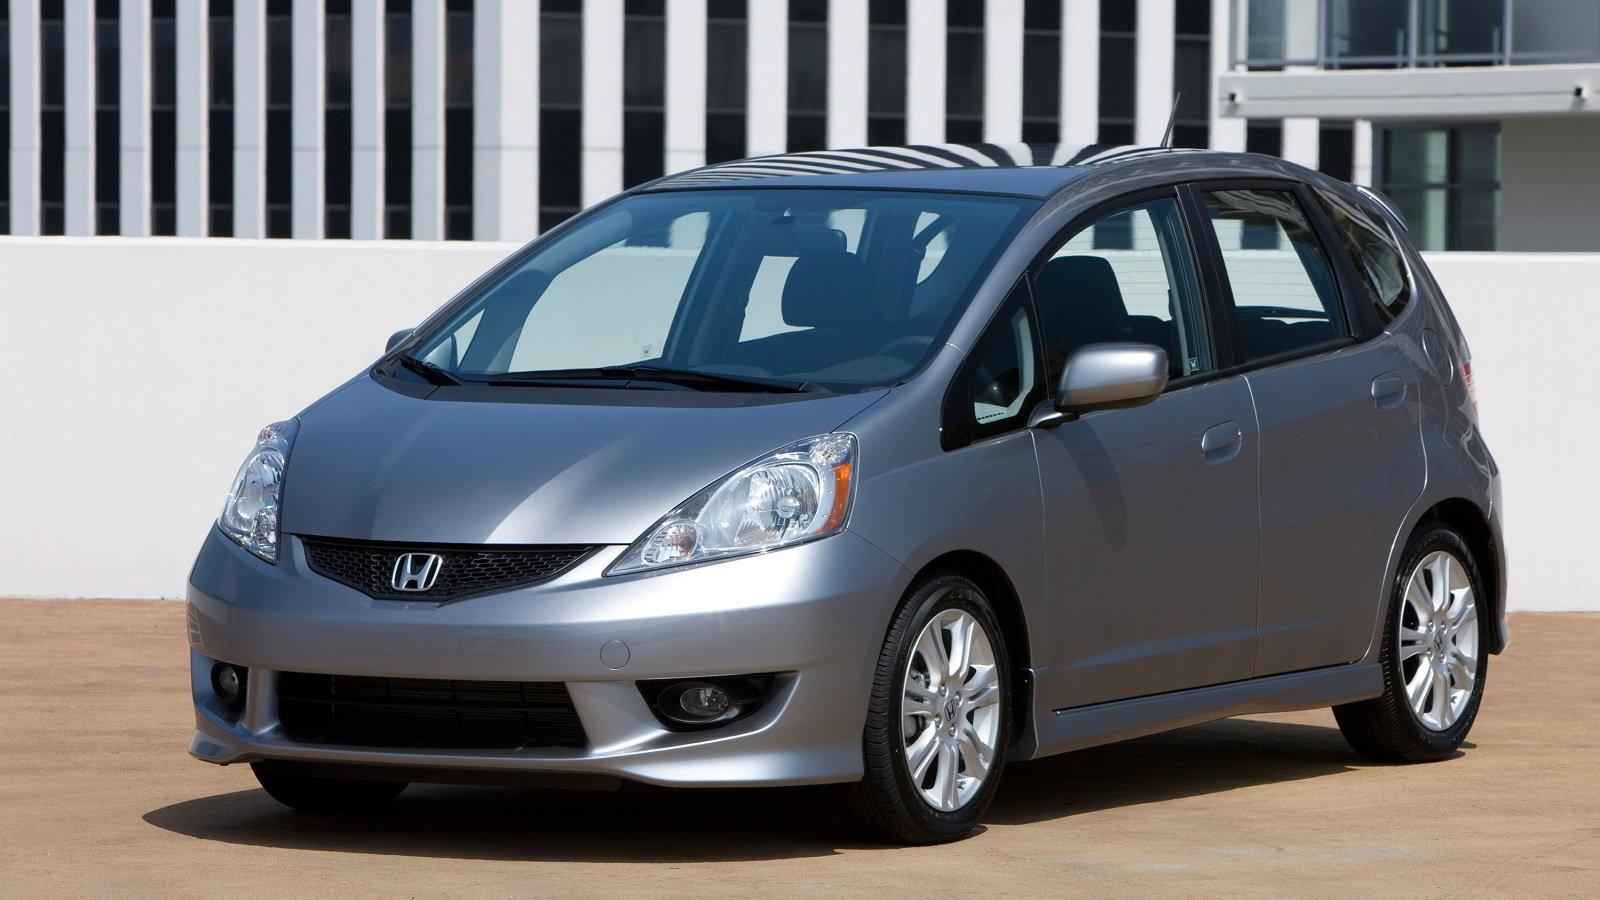 1. Do you like the Honda Fit?